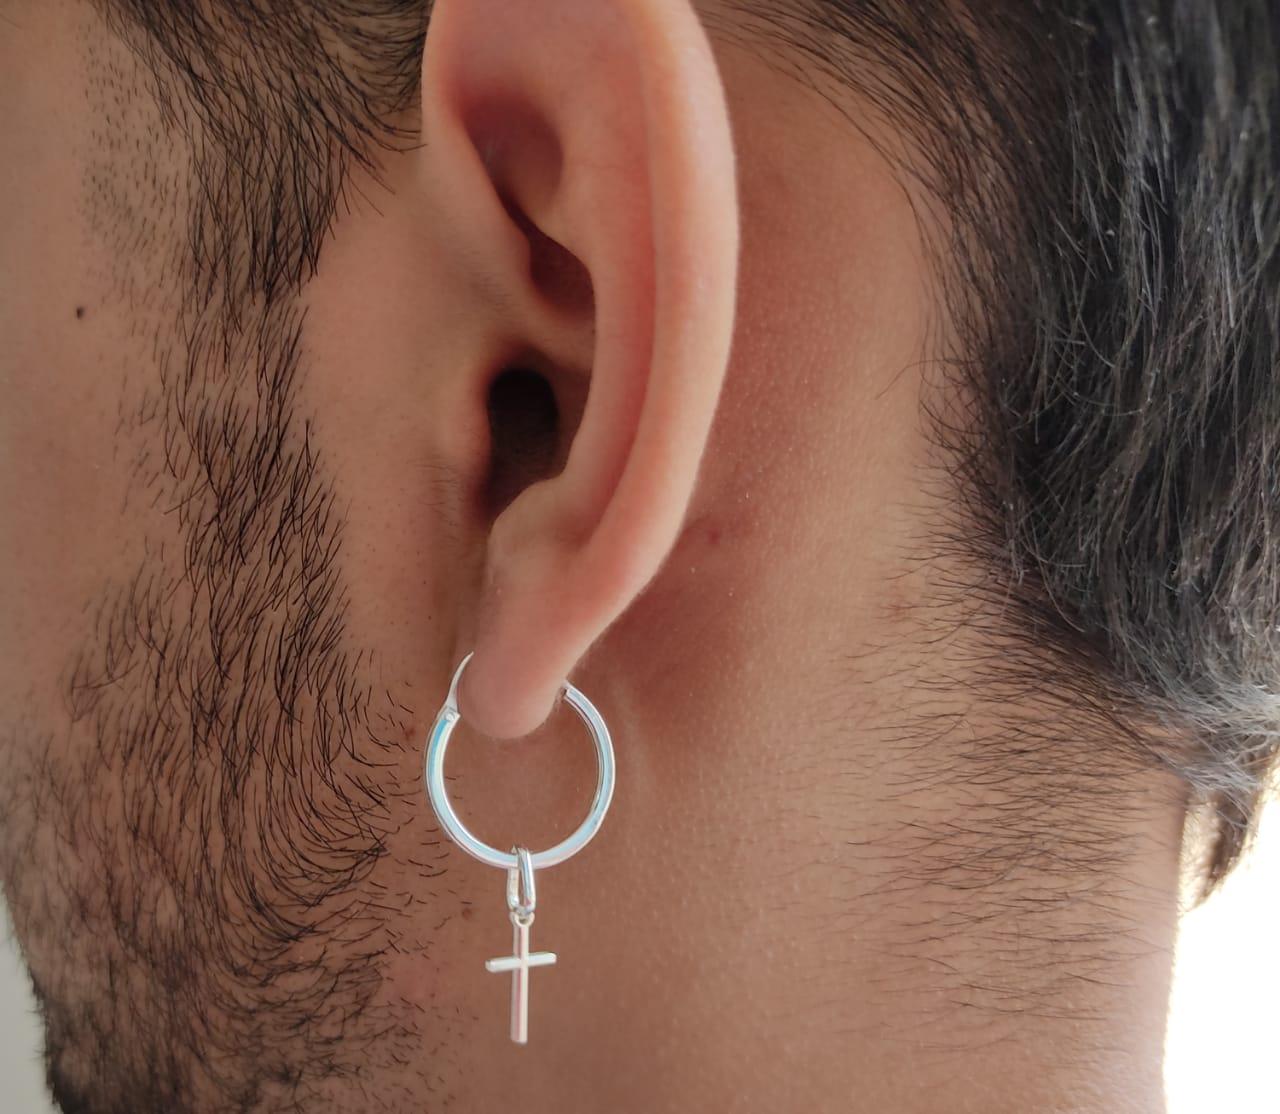 Brinco Masculino E Feminino Argola 1.8cm Cruz De Prata 925